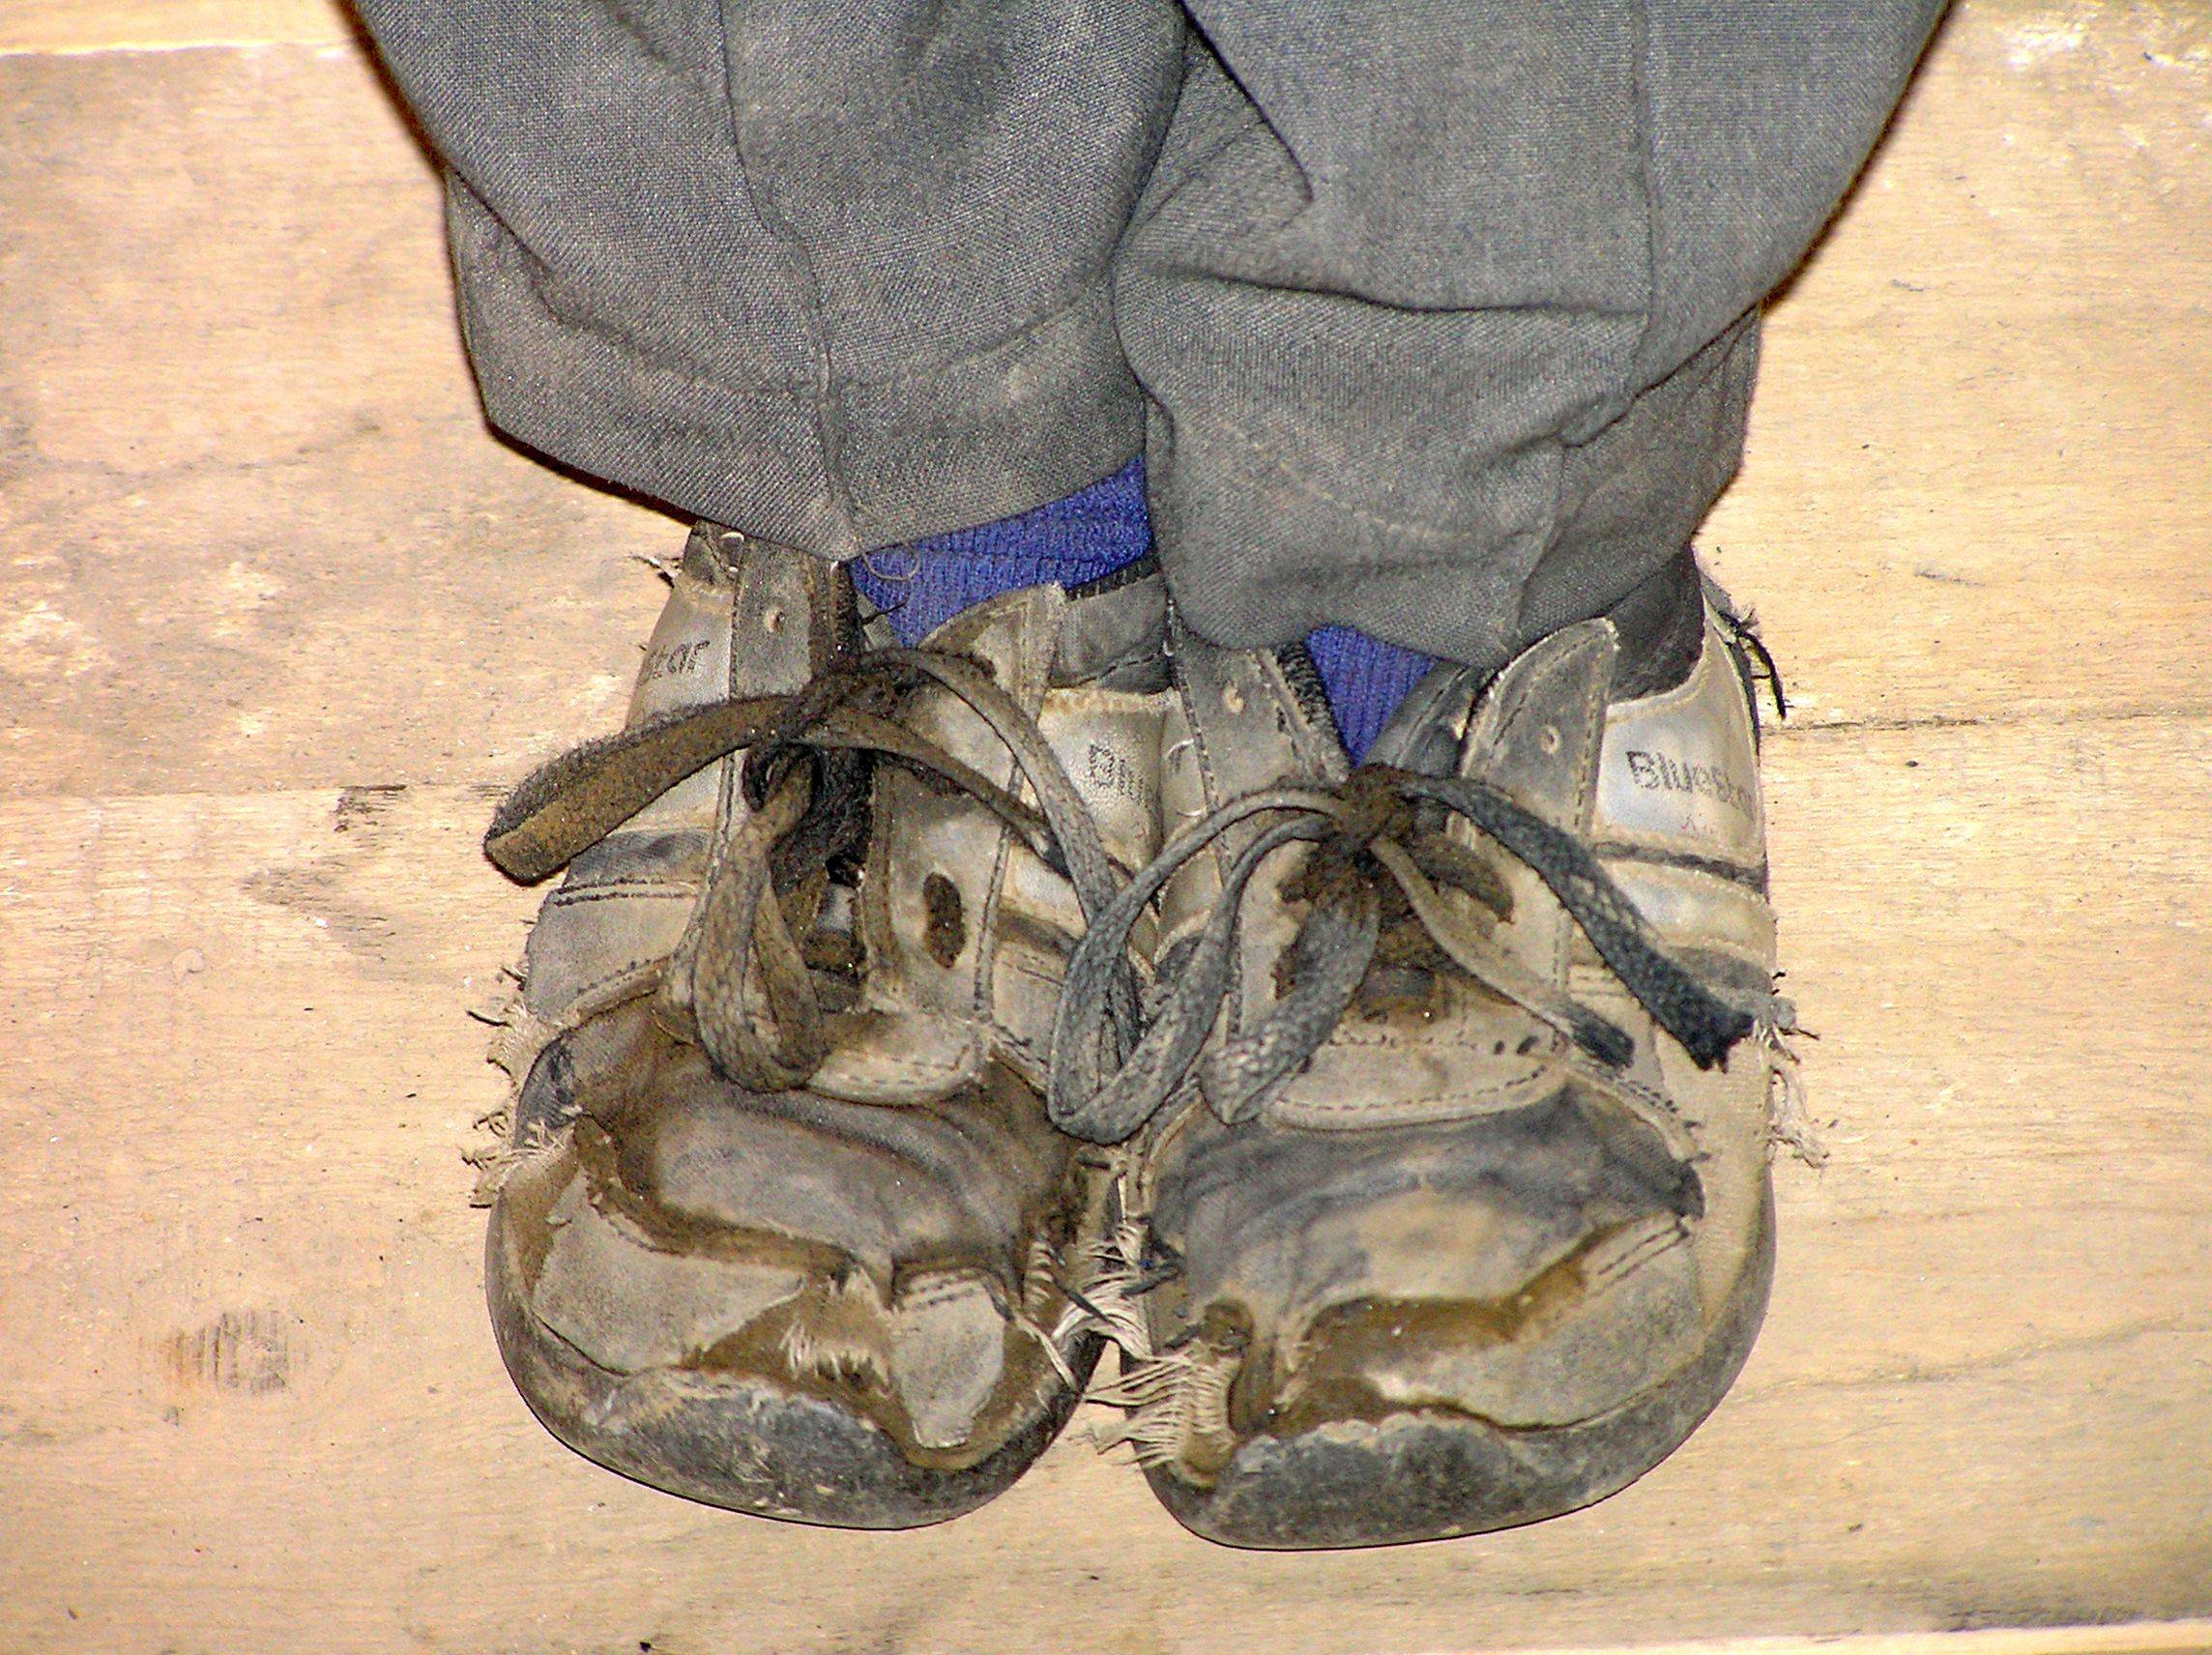 ff48f70db19d Old shoes Iranian boy